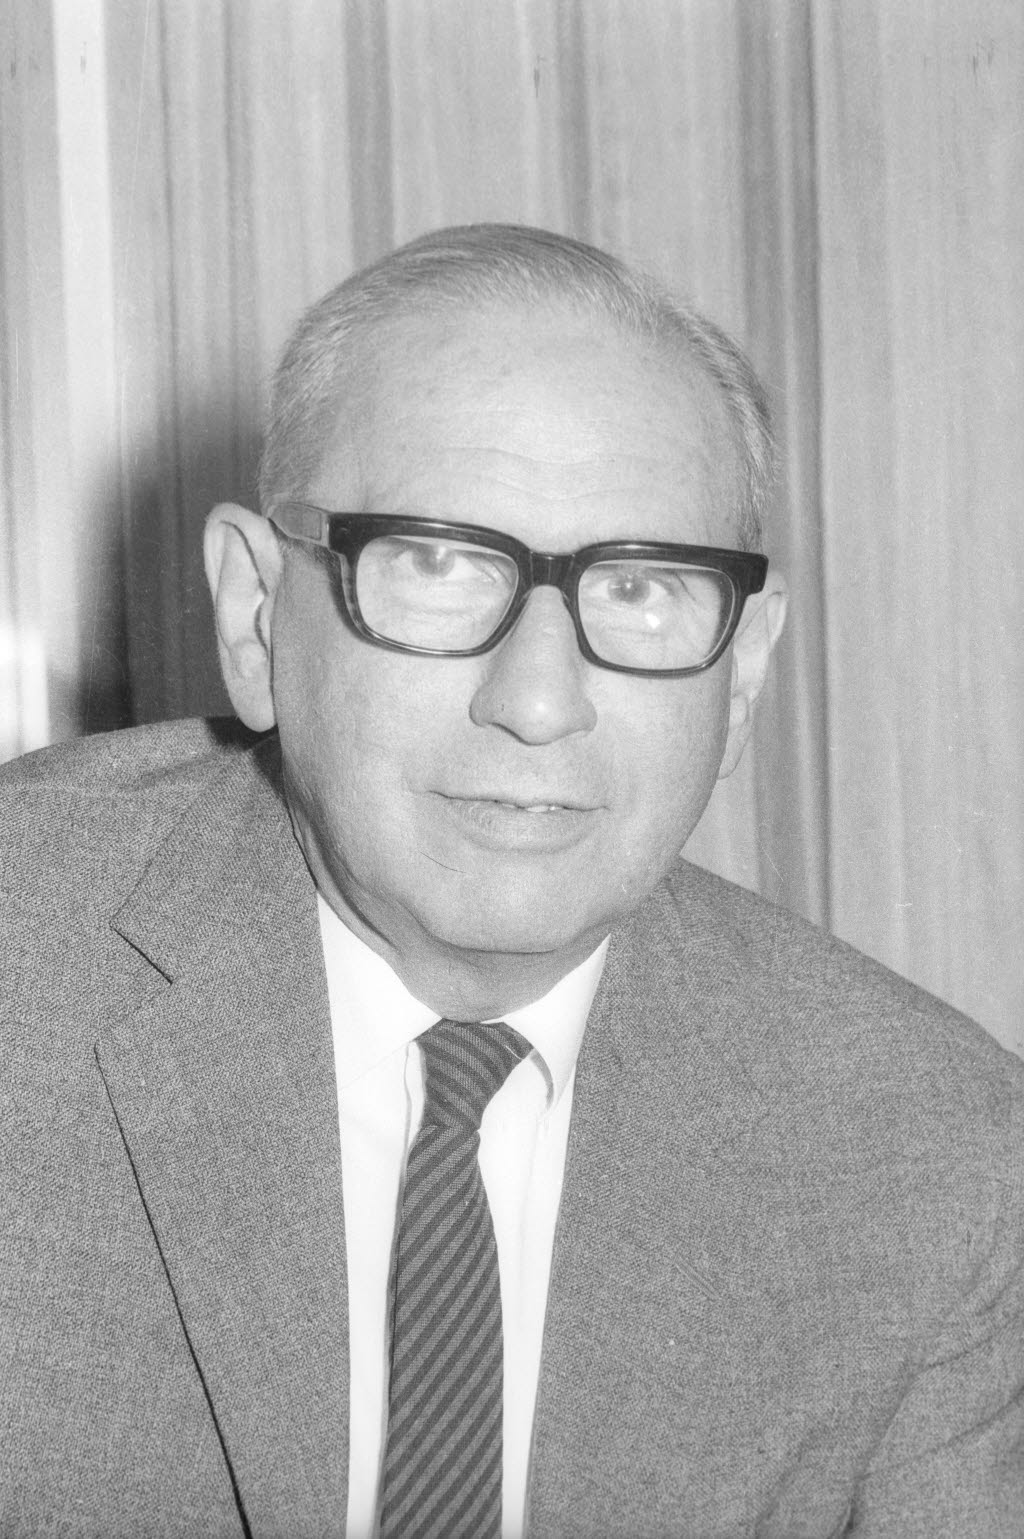 Robert Lembke